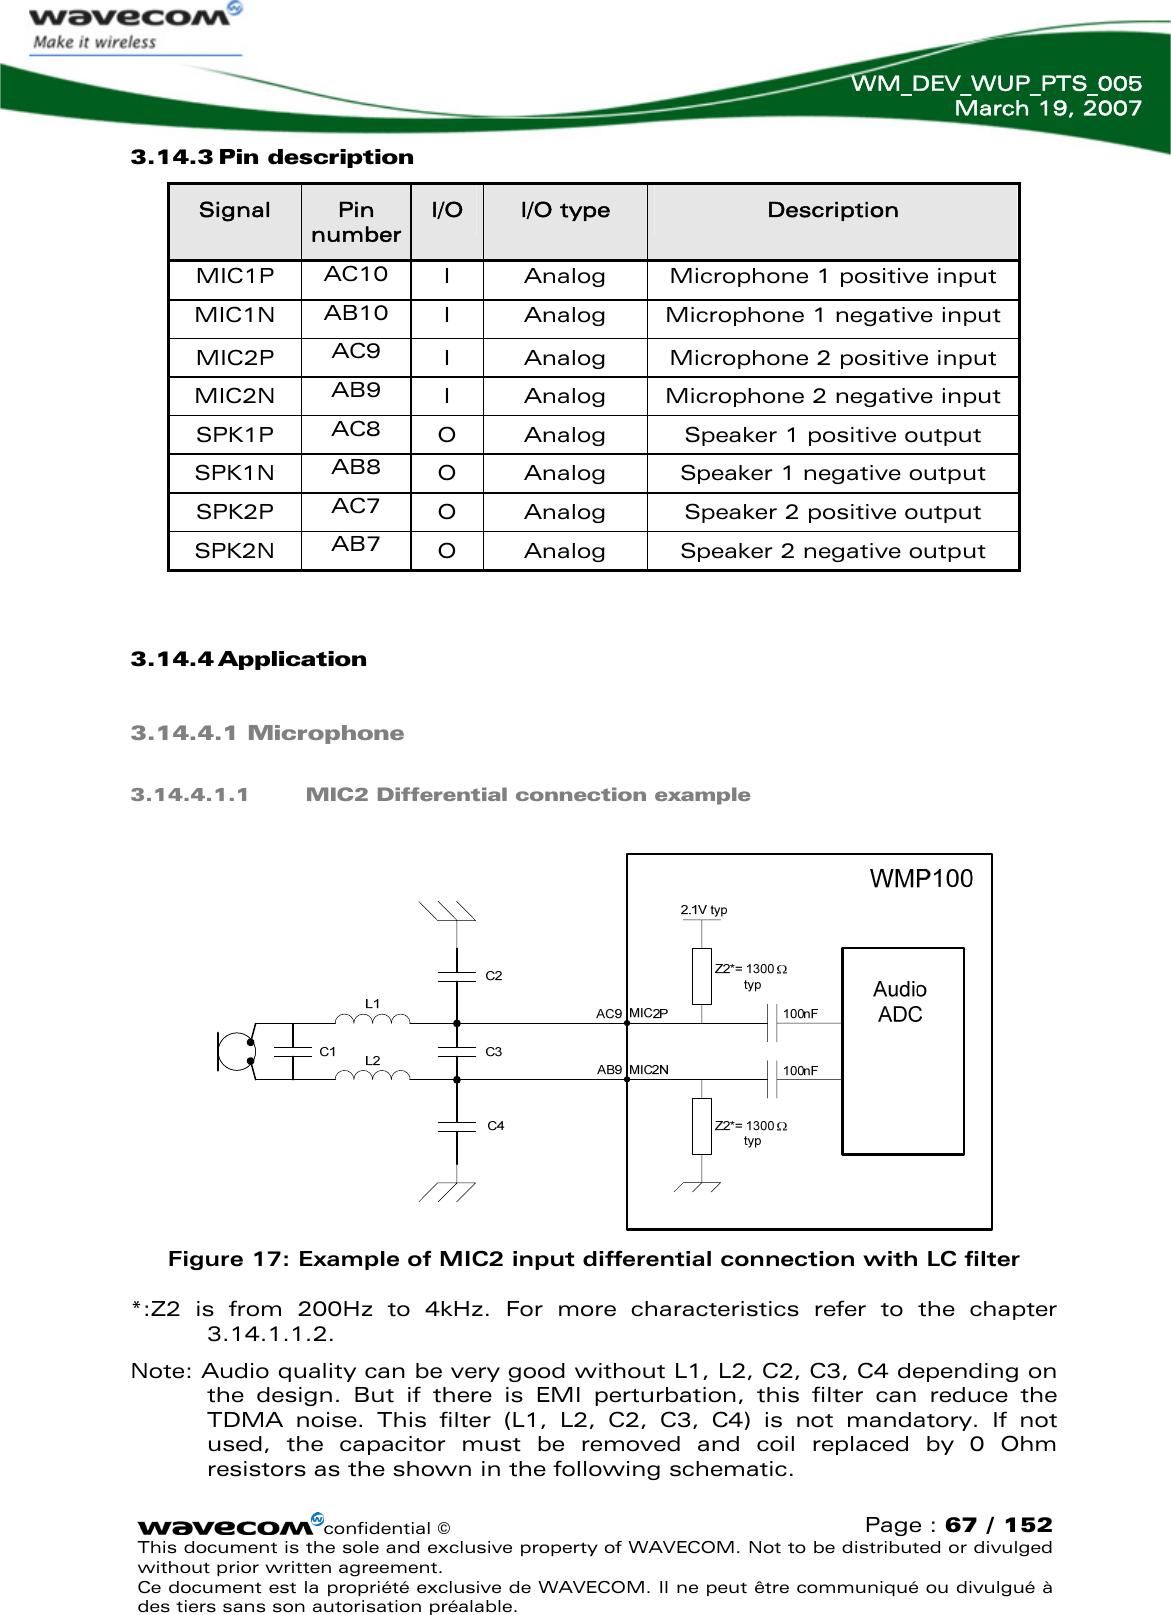 Sierra Wireless Wmp100 Quadband Gsm Module User Manual Wireless Microprocessor Wmp100 Oass1 0